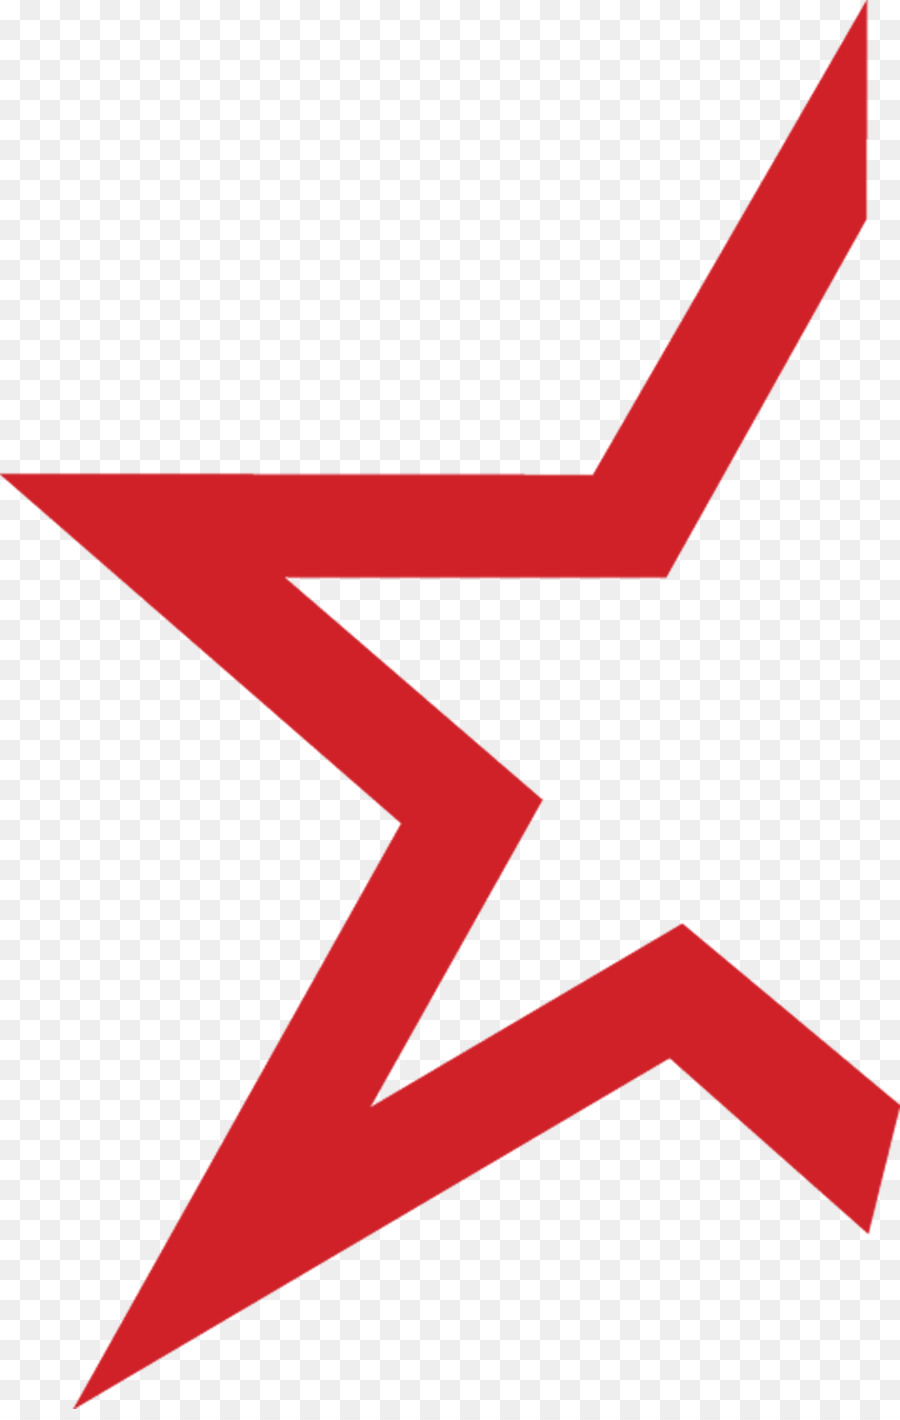 Hy Tech CARSTAR Star Collision Kar Kare Auto Body Repair And Rhino Liners Linings AB Of St Joseph